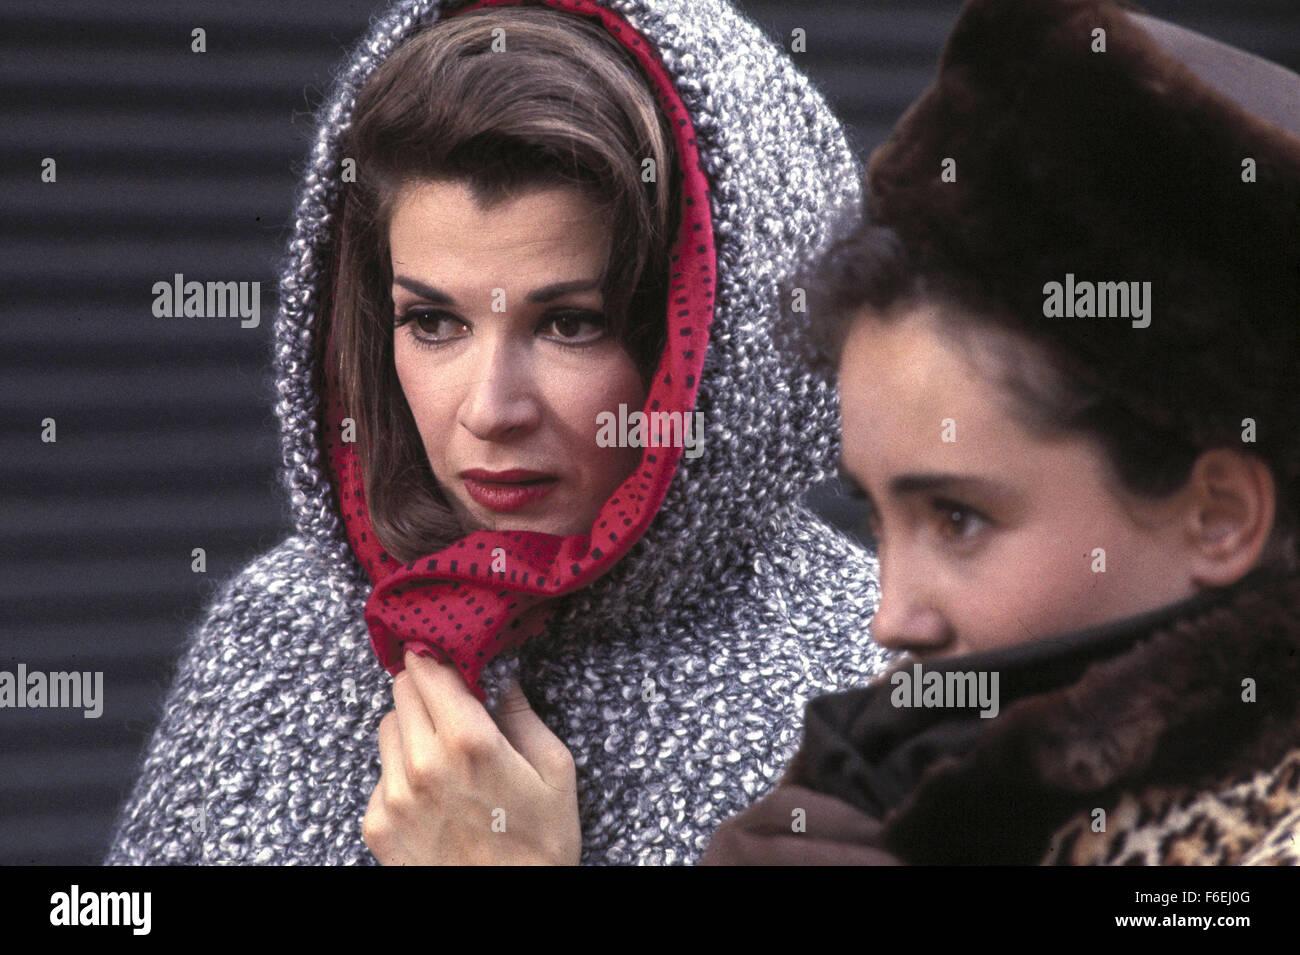 Sonia rossi dating berlin